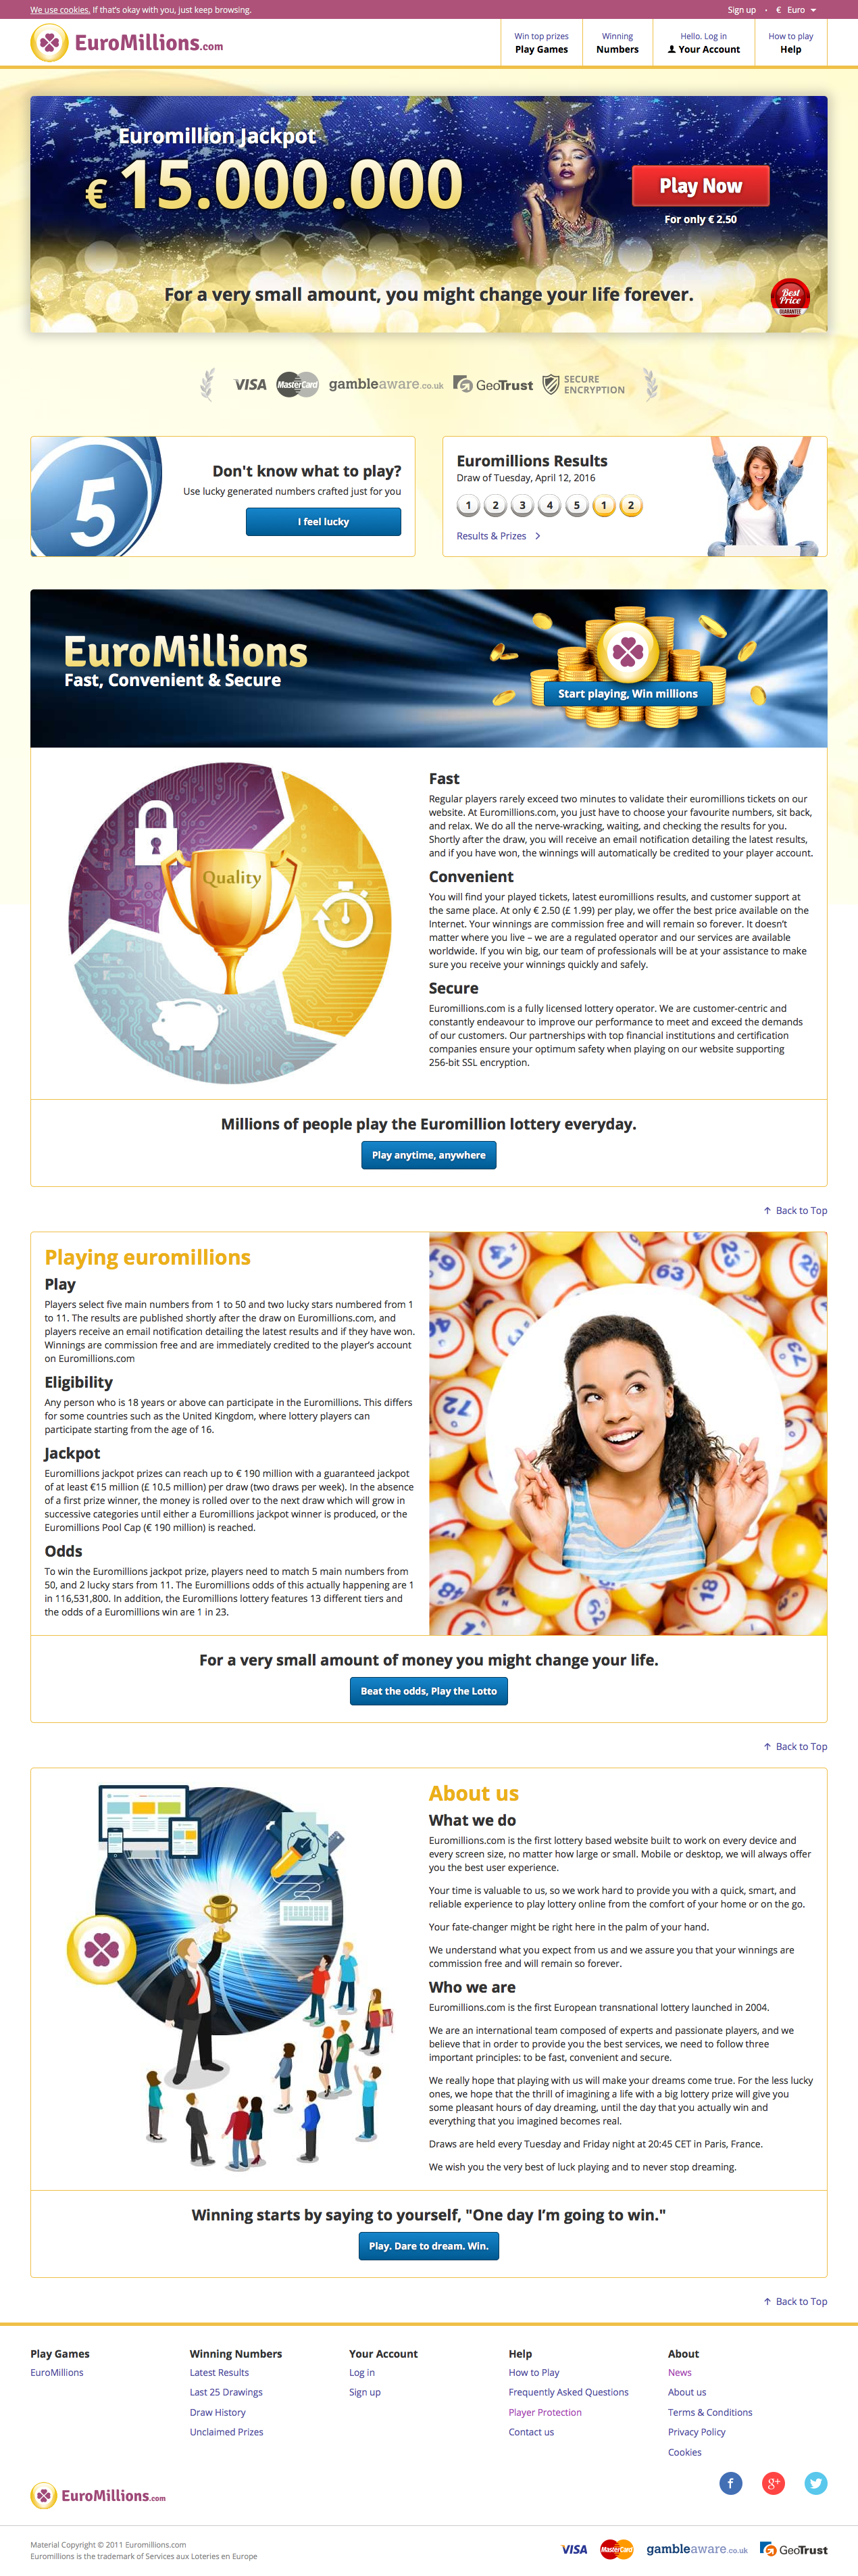 Euromillions.com - Homepage